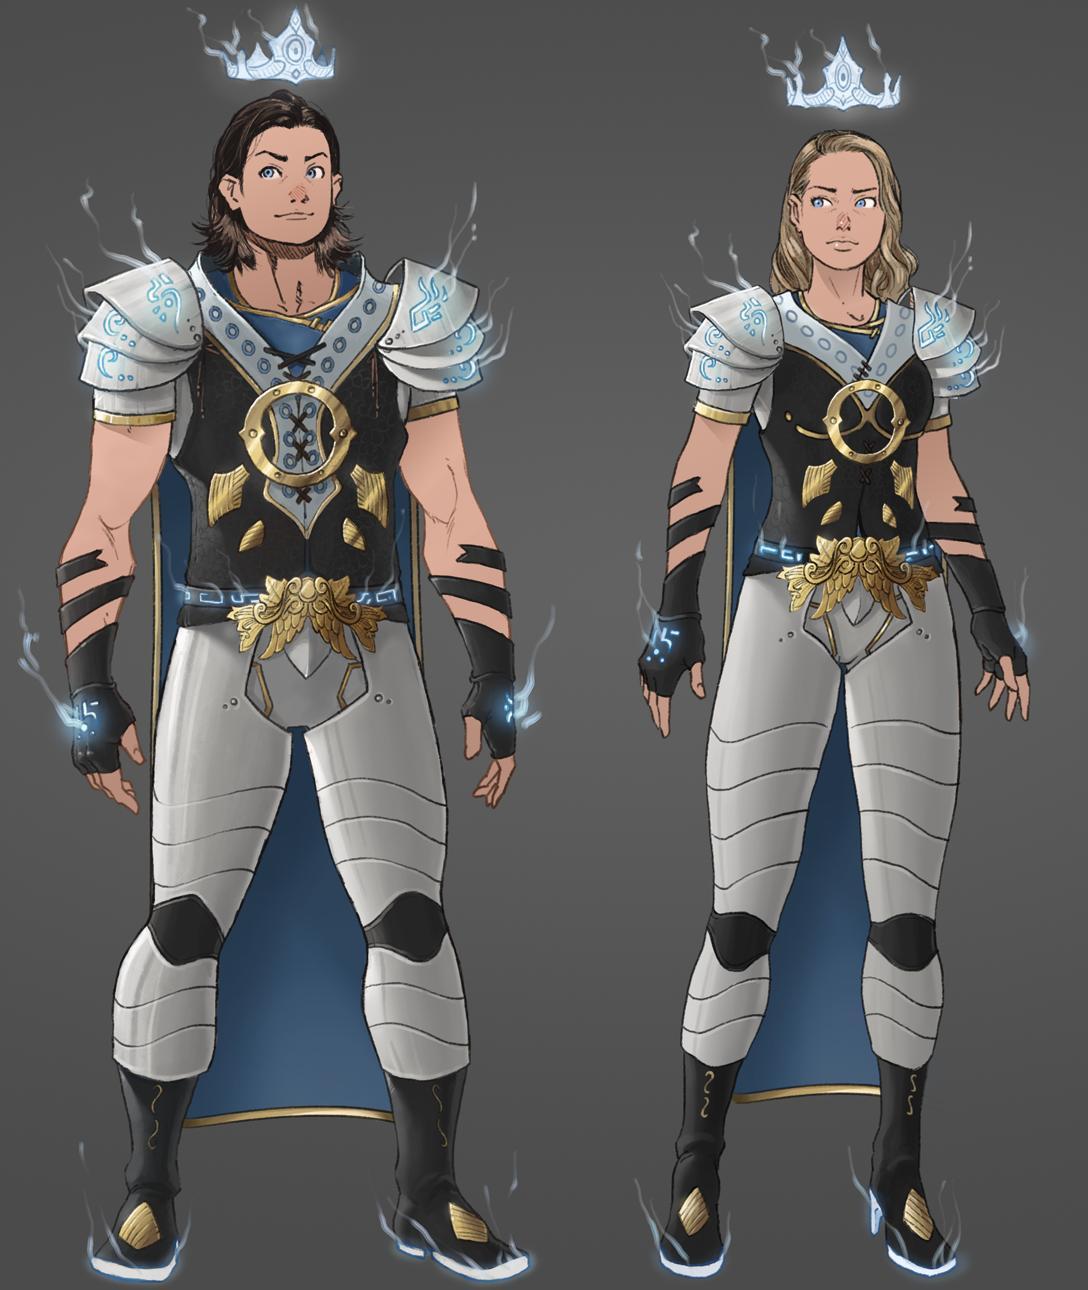 Oath MMORPG kickstarter character art 3